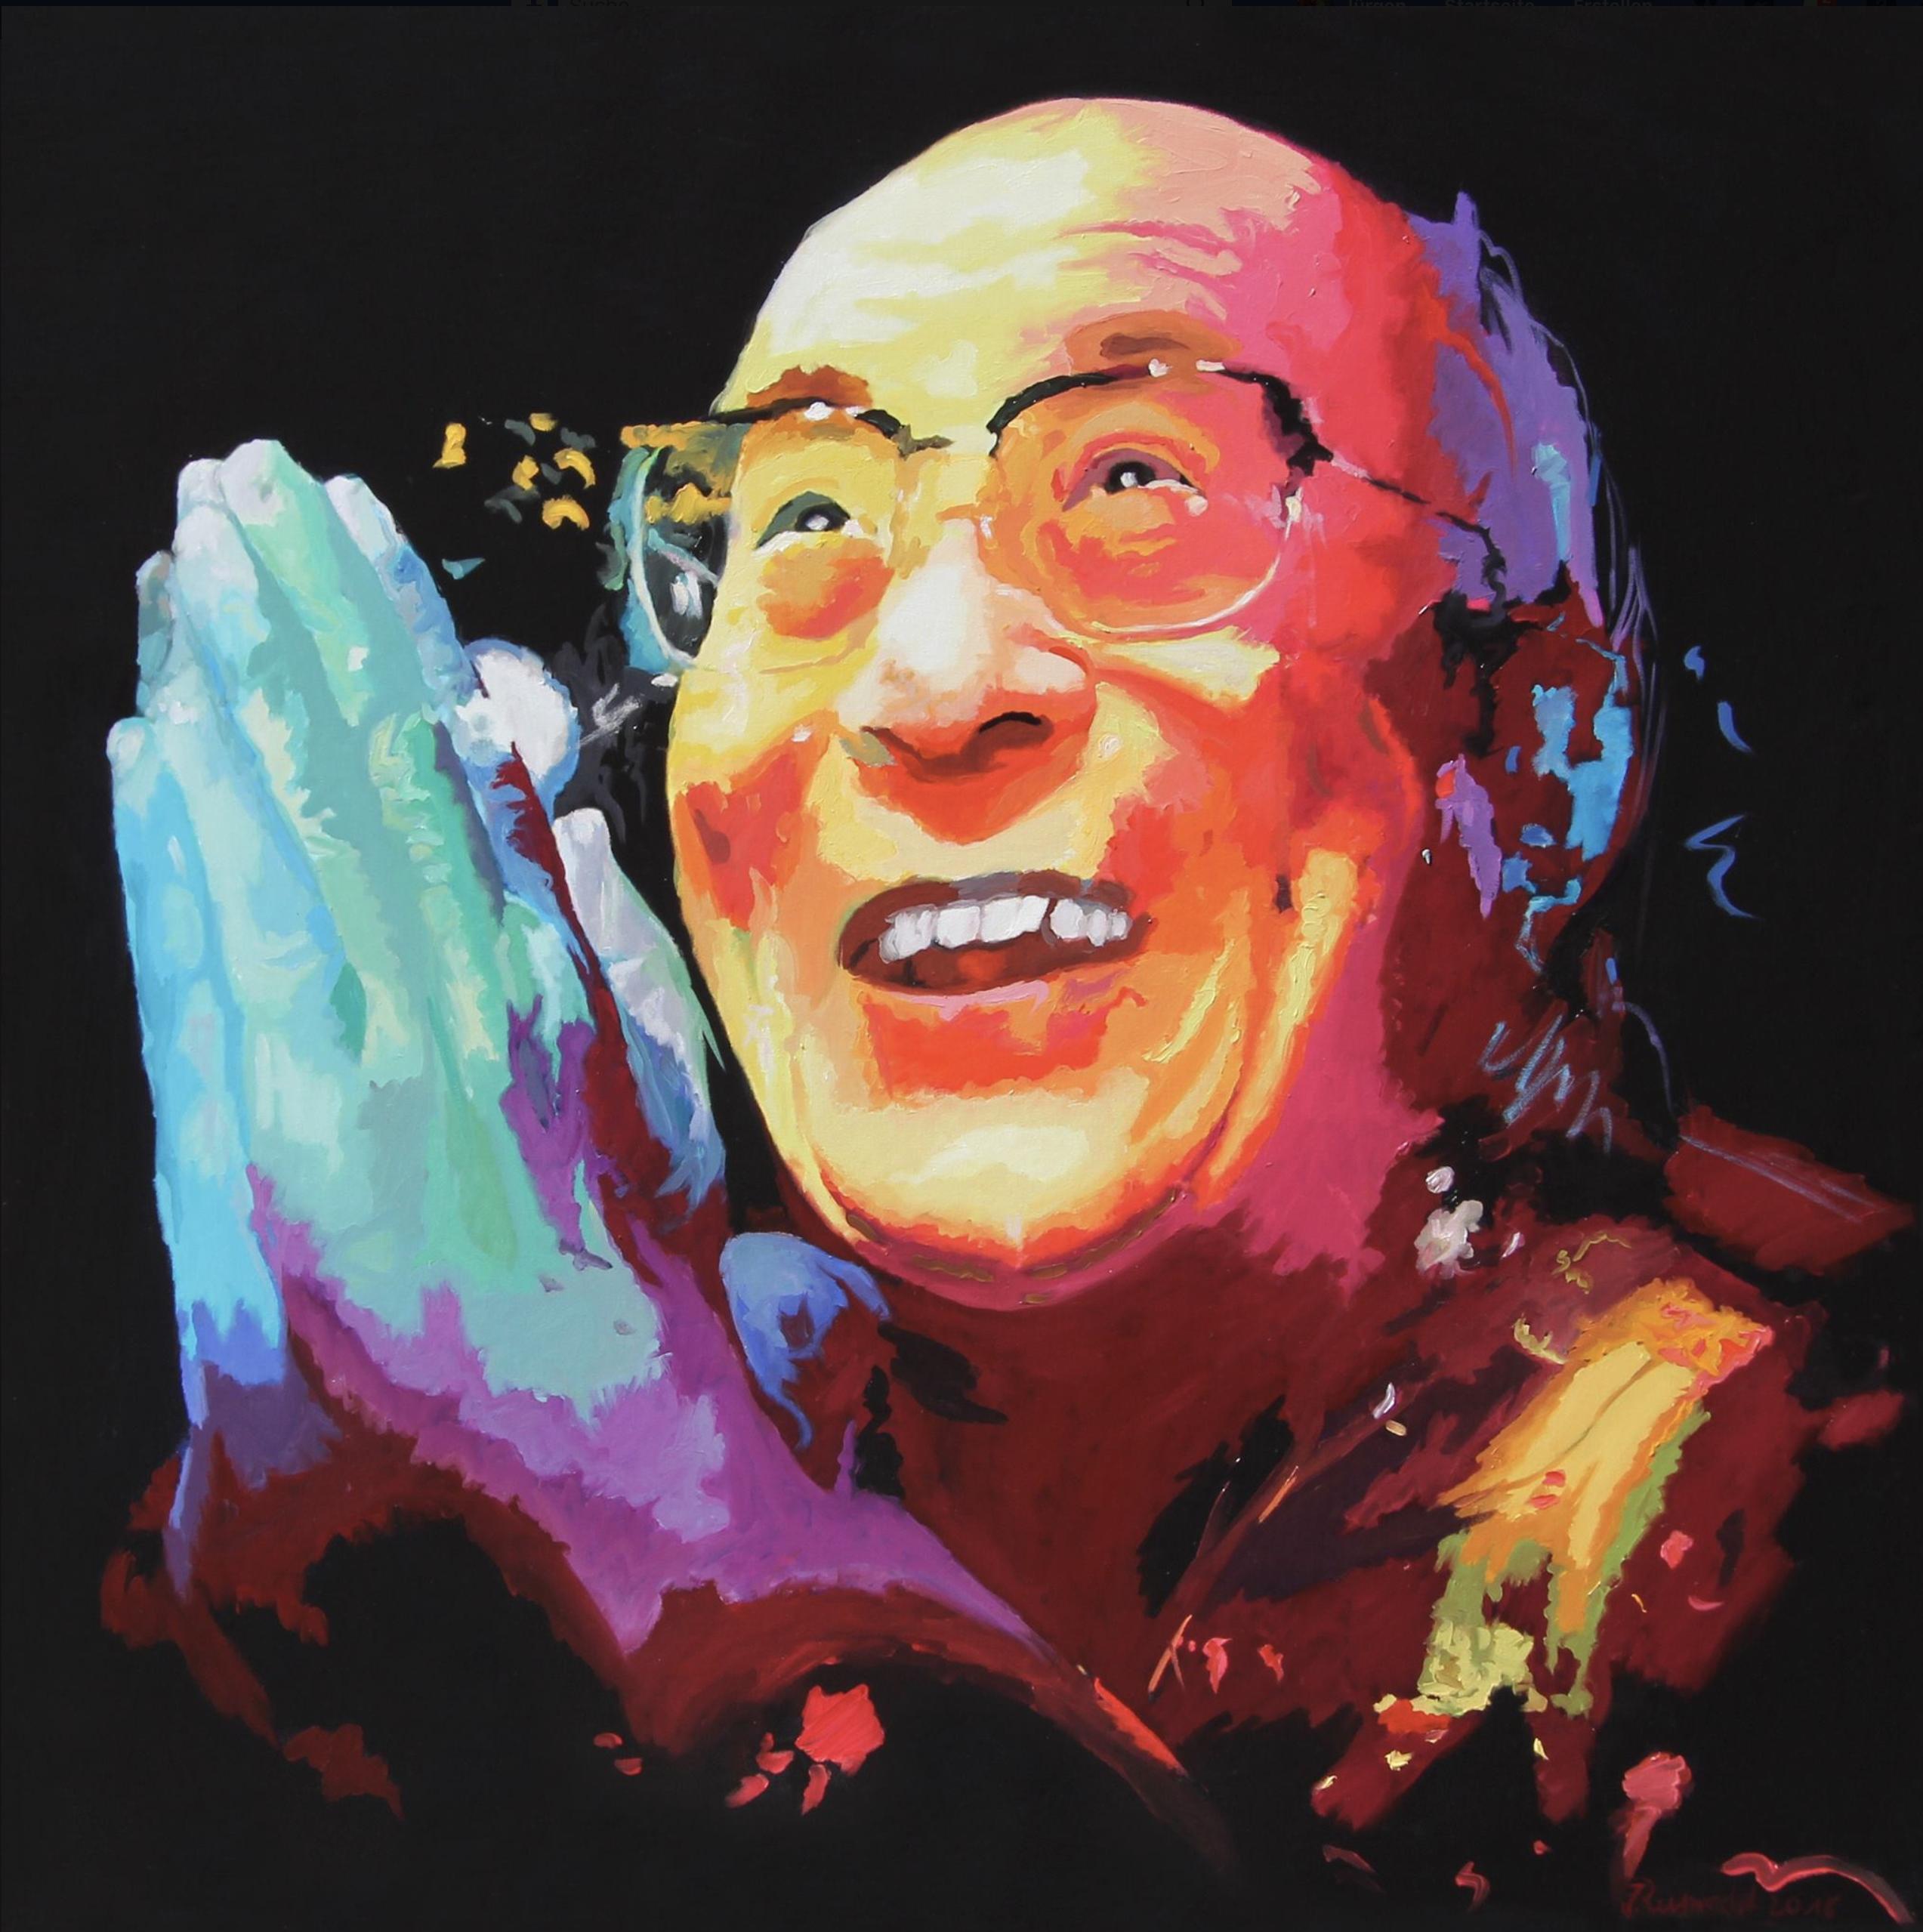 Dalai_Lama_Öl_auf_Leinen_110_x_110_cm